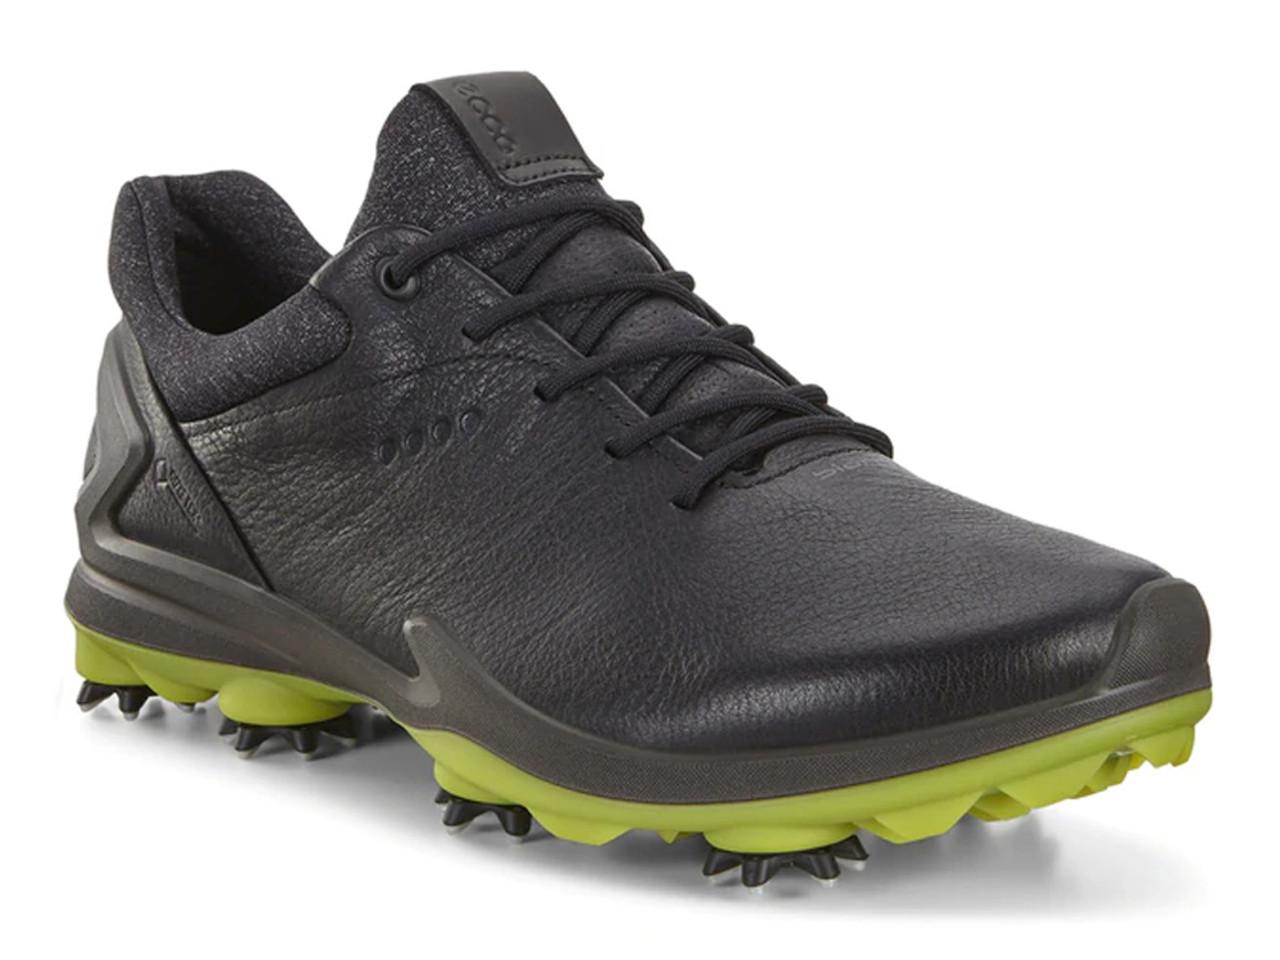 quality design professional website variety design Ecco Biom G3 Golf Shoes - Black